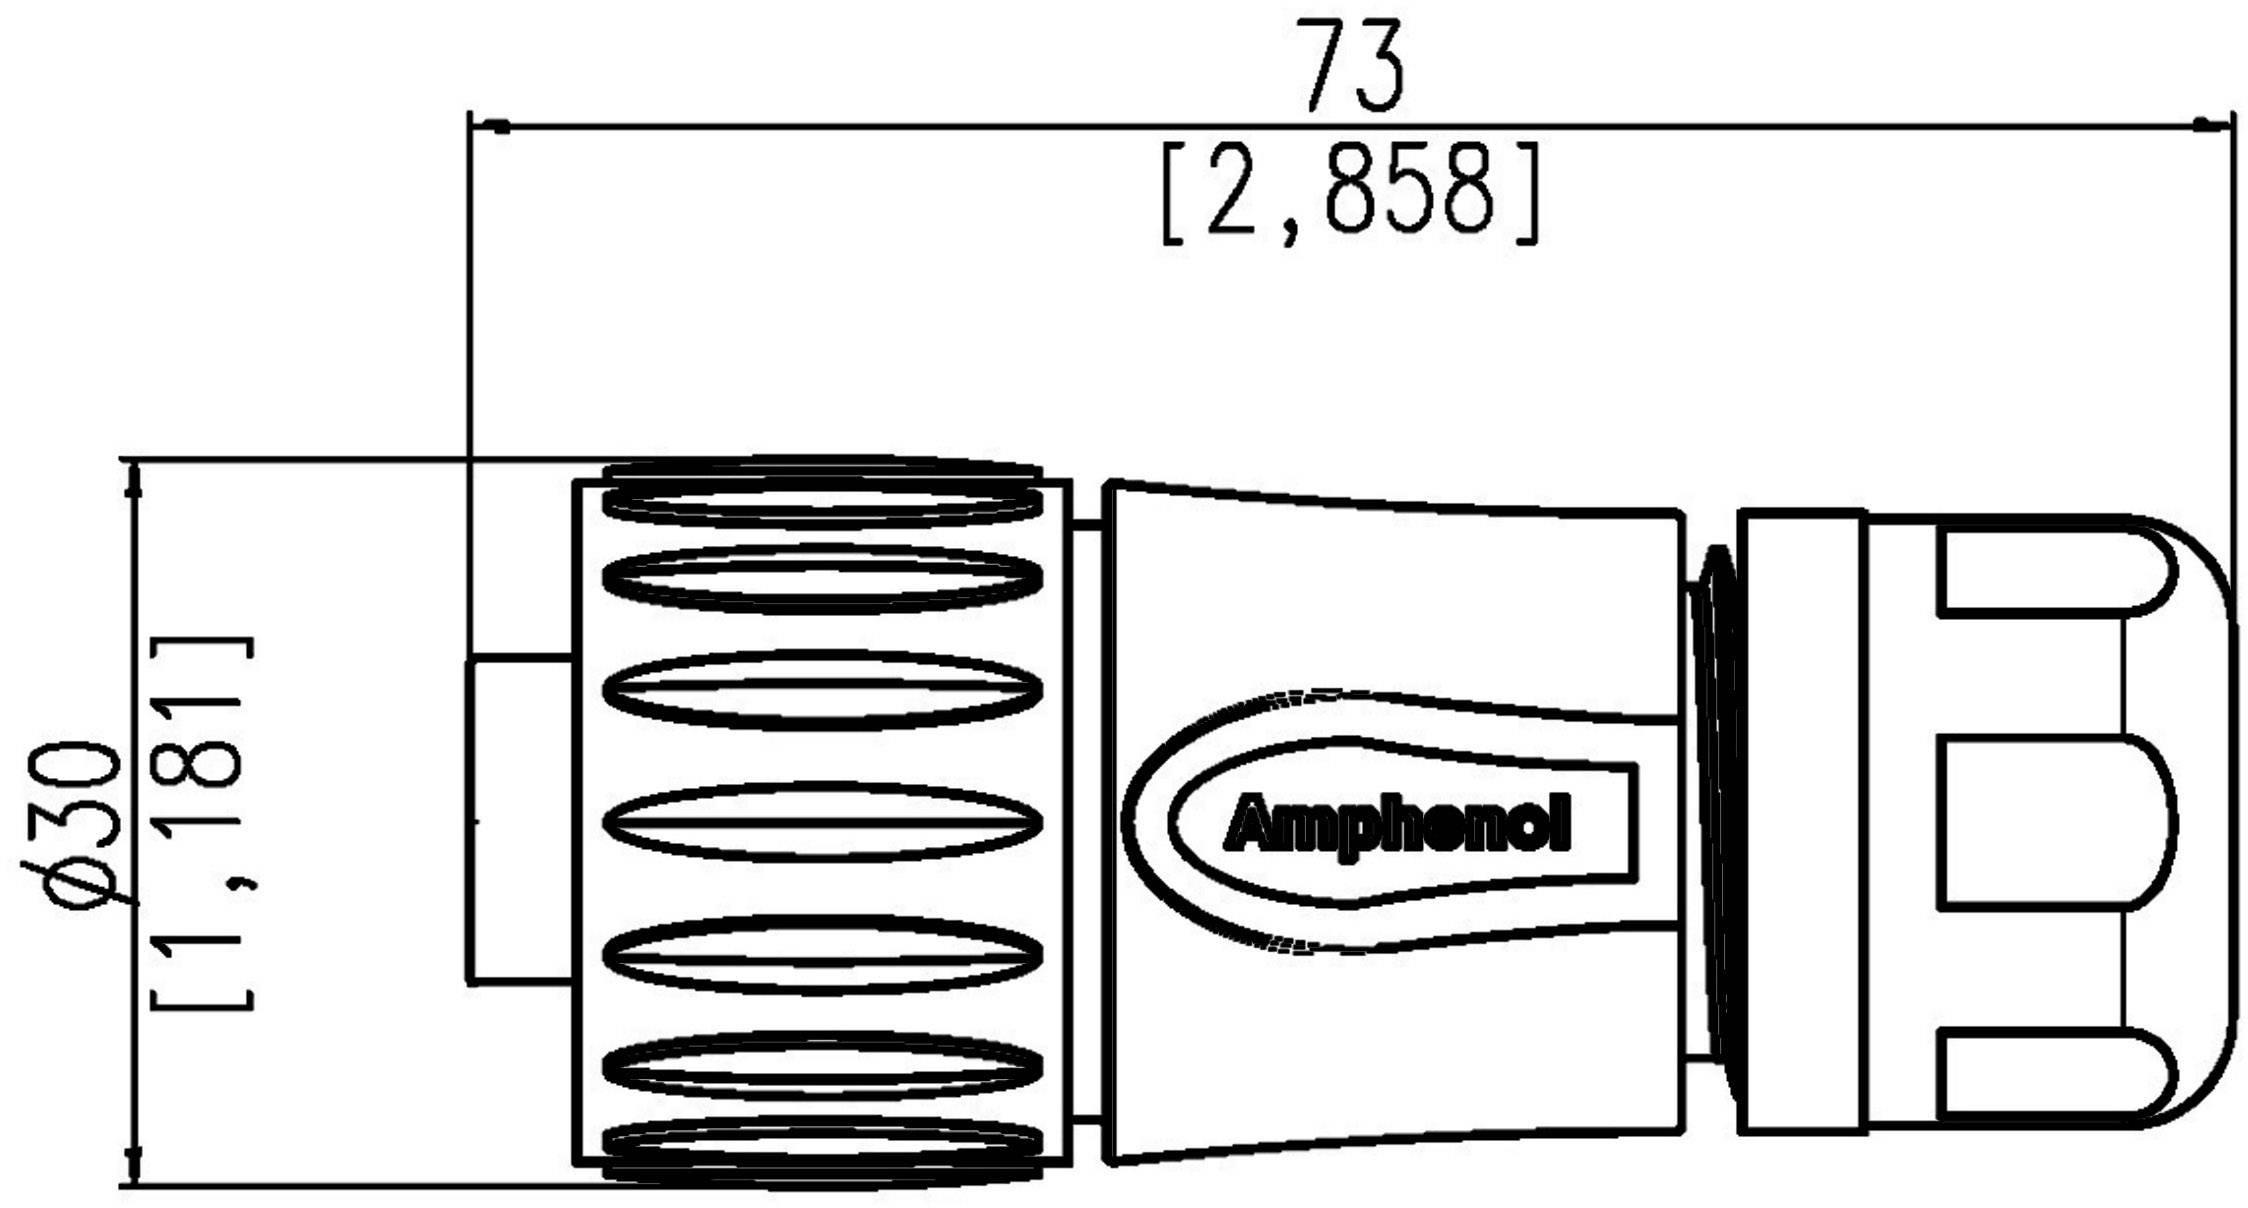 Amphenol C016 20D003 110 10 IP67 (v zablokovanom stave), polyamid 6.6, pólů + PE, 1 ks